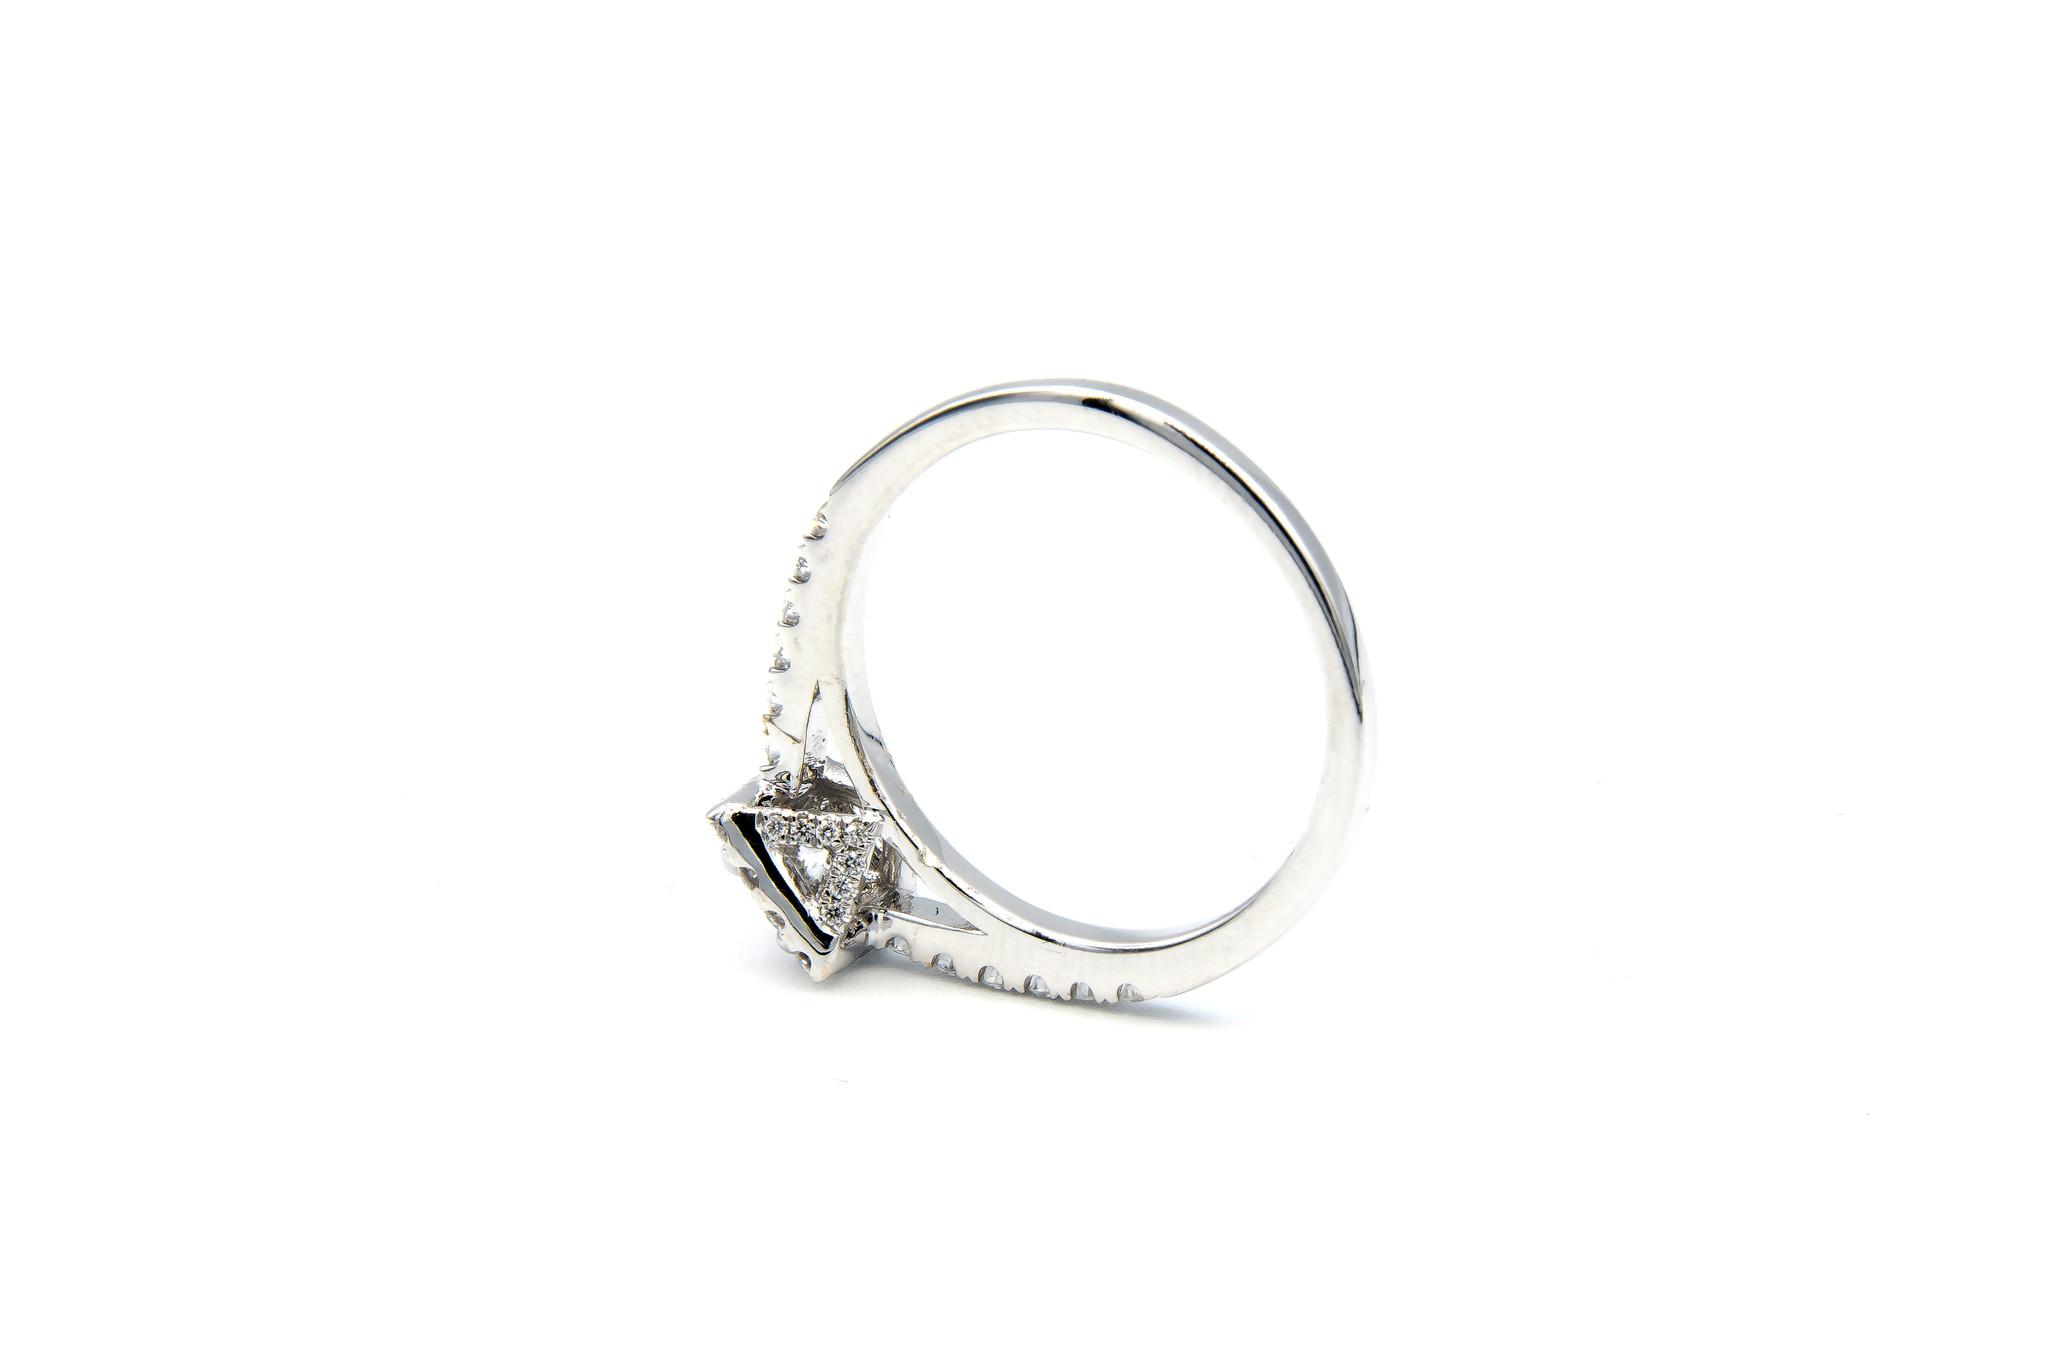 Ring verlovingsring witgoud met 0,2 ct SI en 0,28 ct VS diamant-2